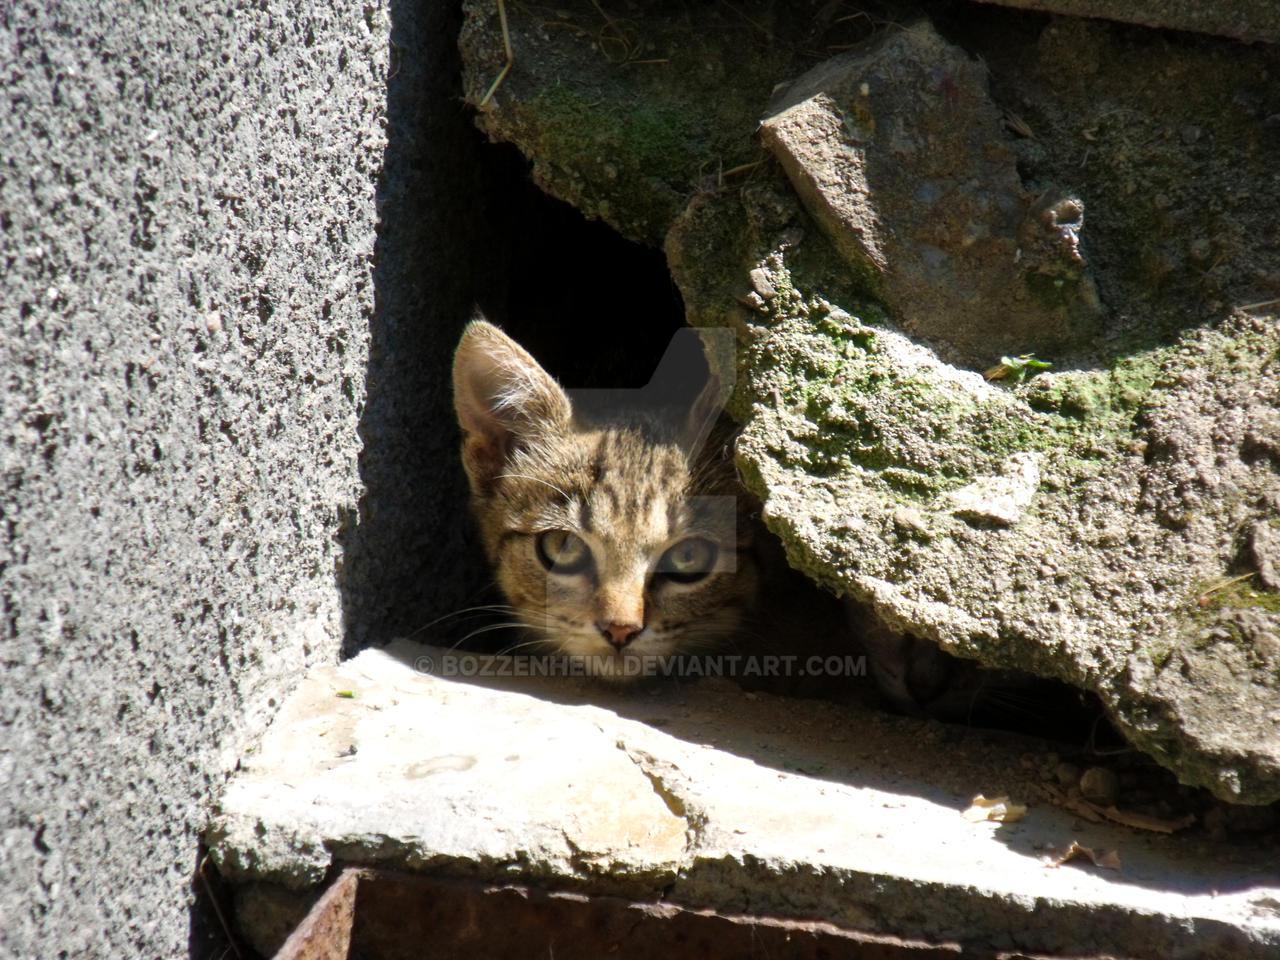 Watchful eyes by Bozzenheim